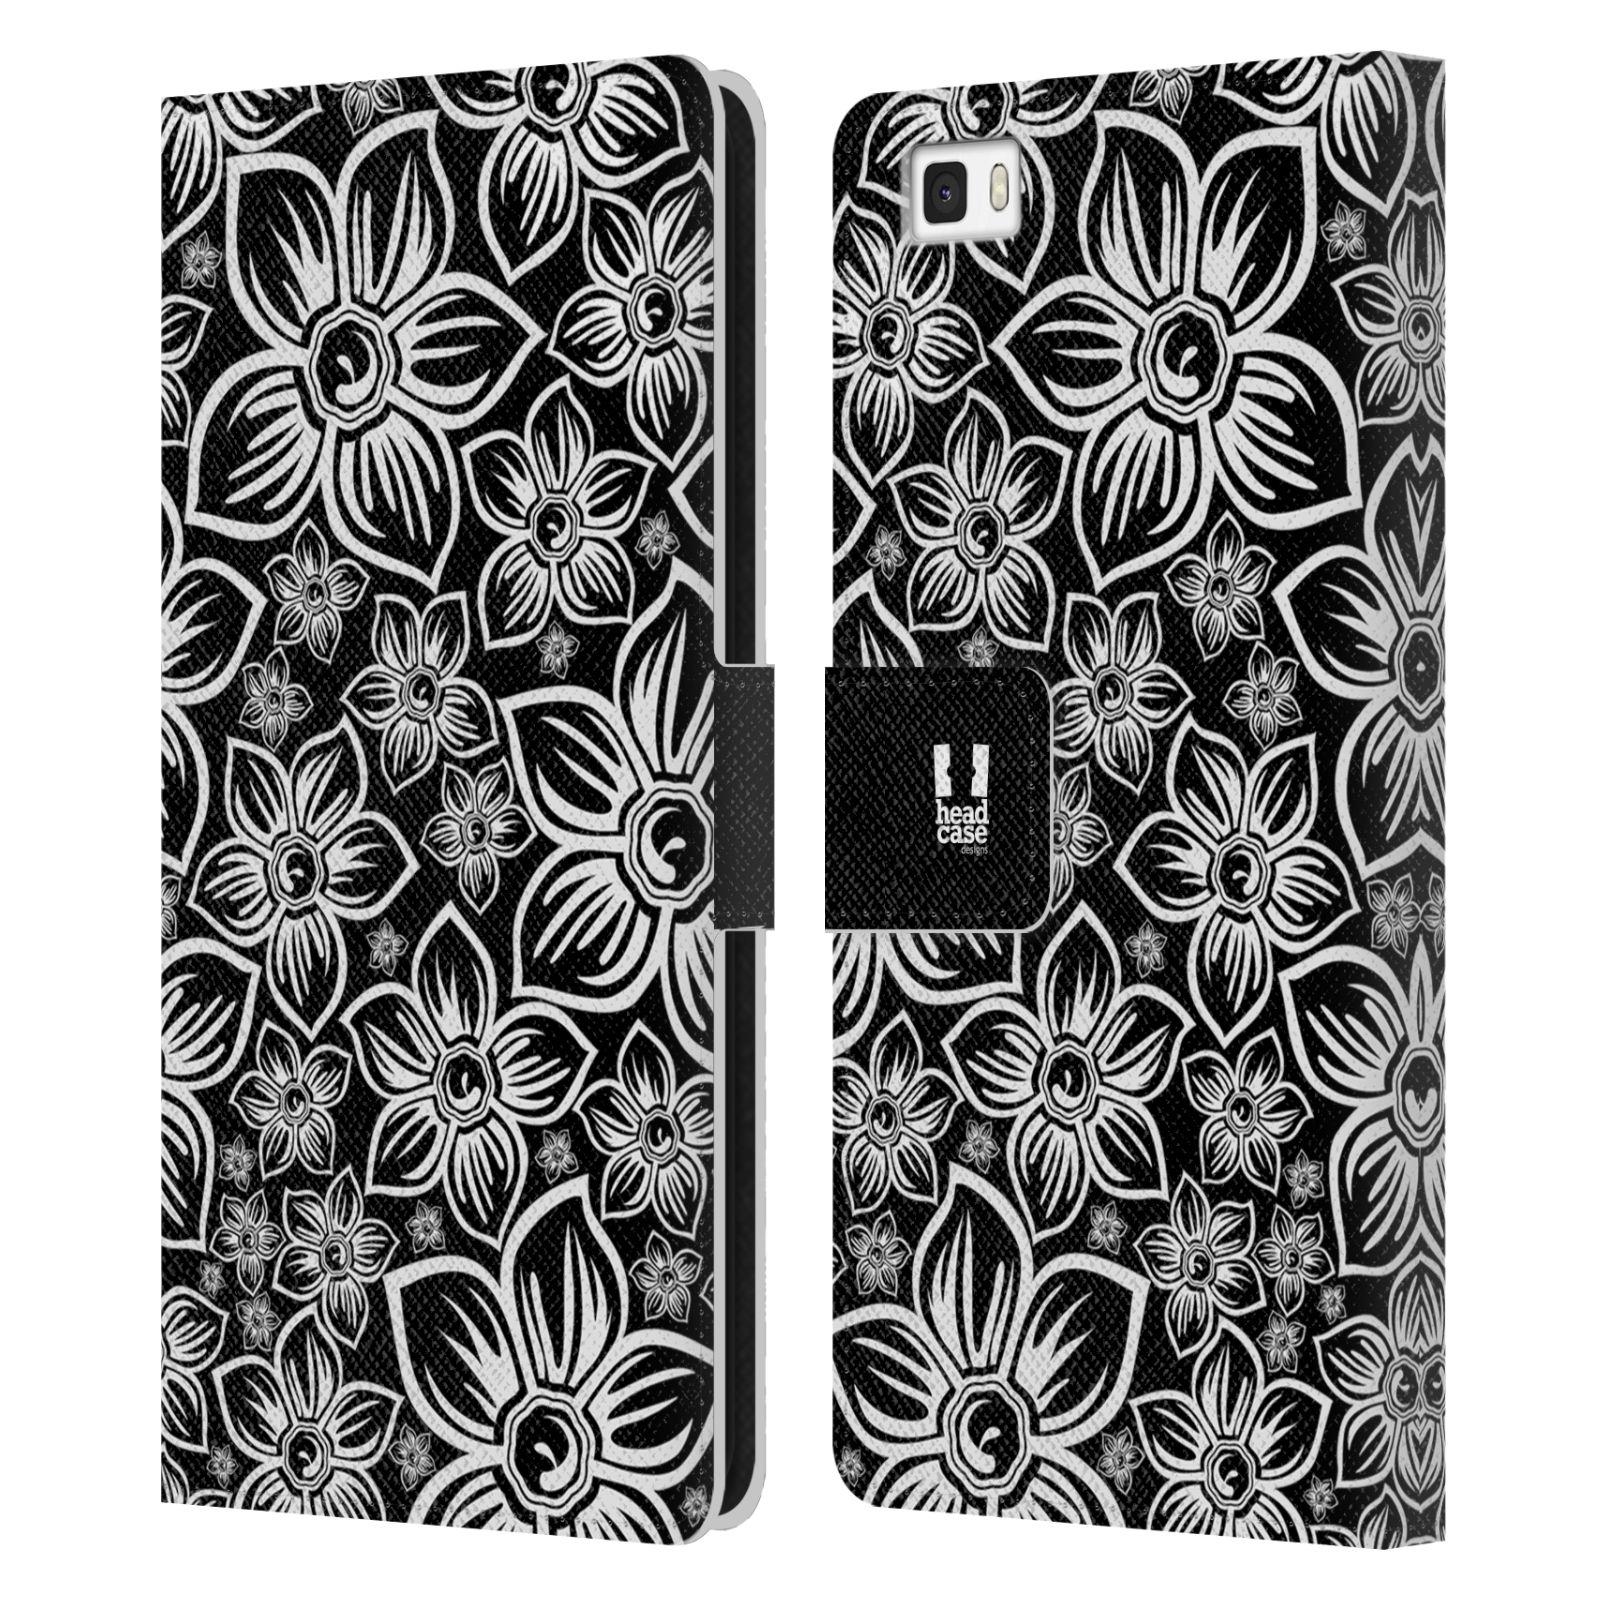 HEAD CASE Flipové pouzdro pro mobil Huawei P8 LITE ČERNOBÍLÁ KVĚTINA sedmikráska